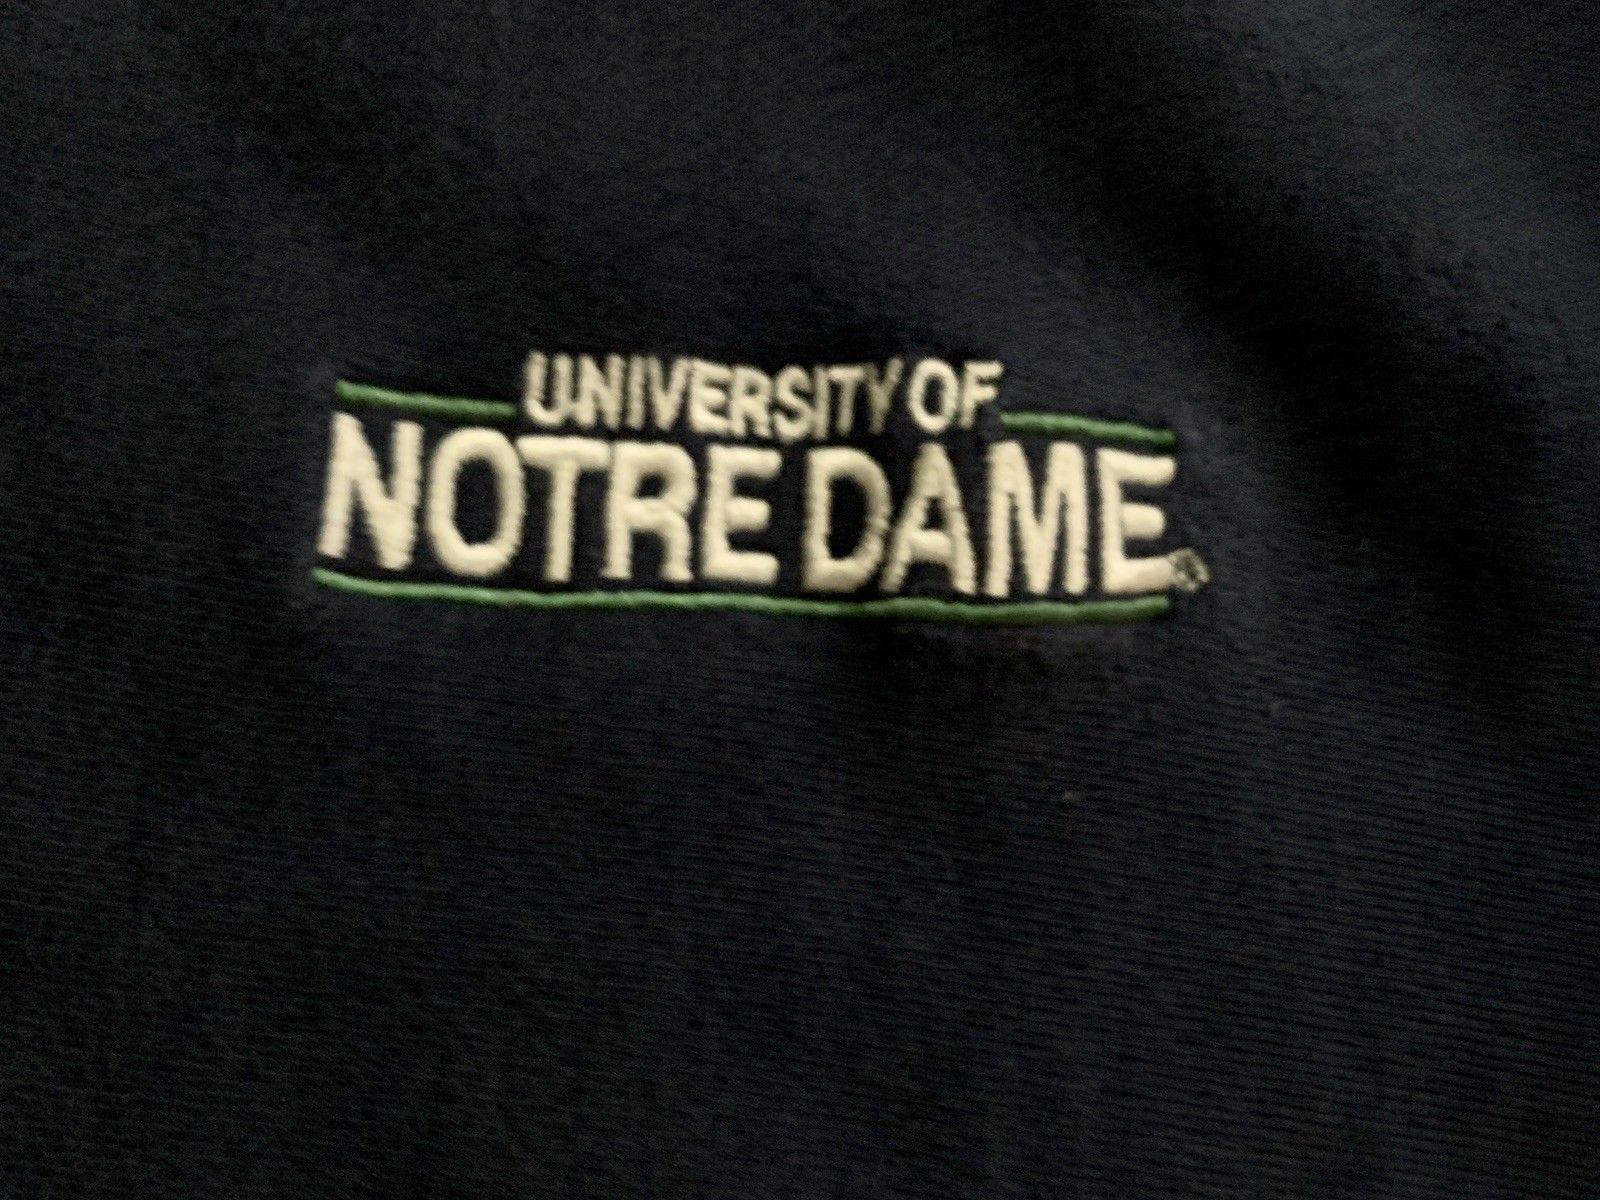 Champion Notre Dame Irish Sweatshirt sz L ND REVERSE WEAVE Green USA Exc 80-90s